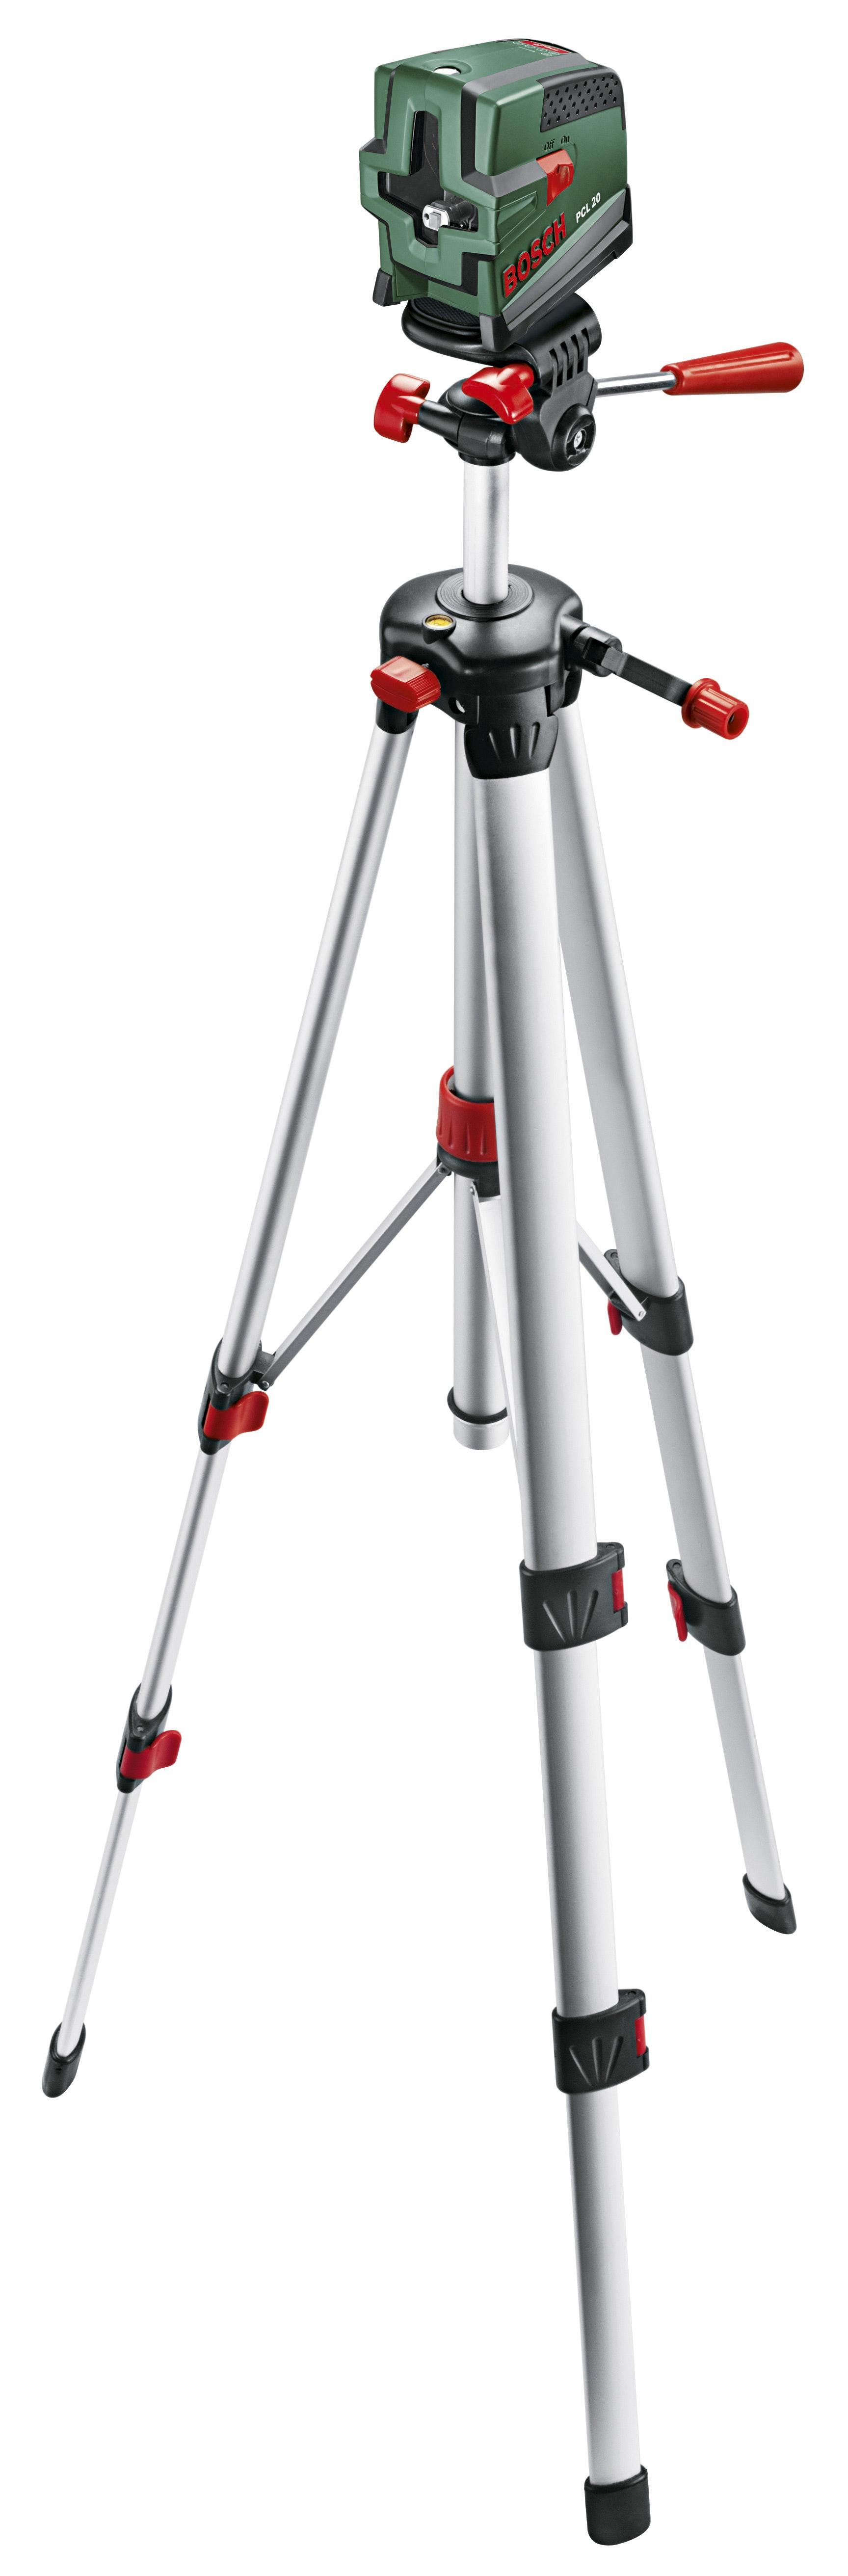 Krysslaser Bosch PCL 20 med stativ